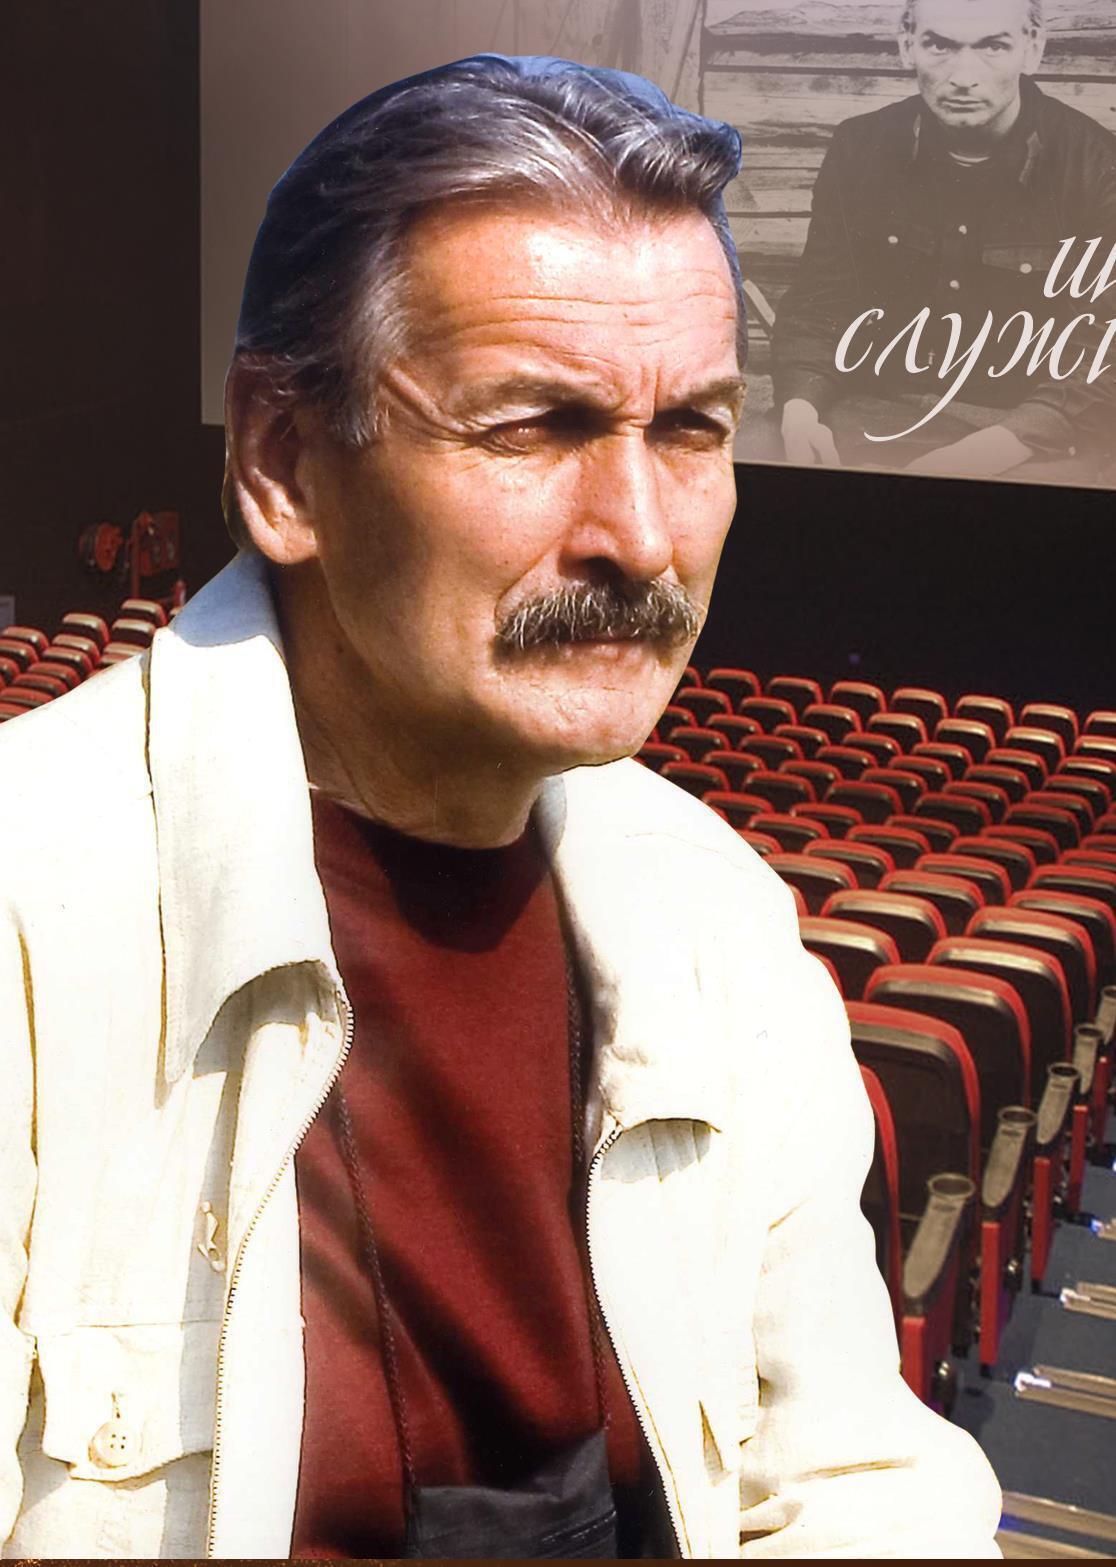 Владимир Талашко – советский и украинский актер